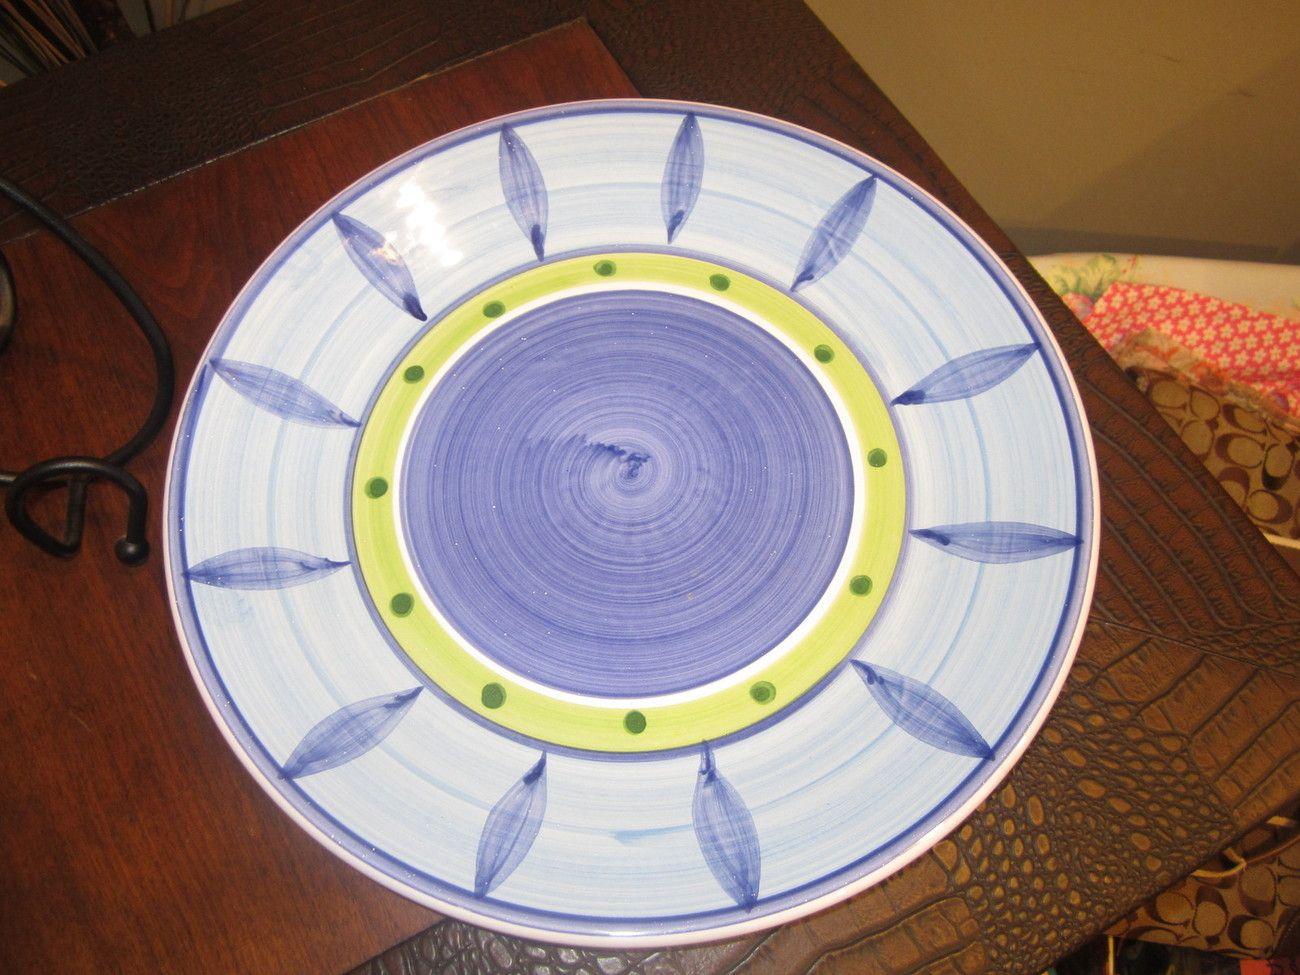 CALECA BLUE MOON CHOP PLATE  $24.49